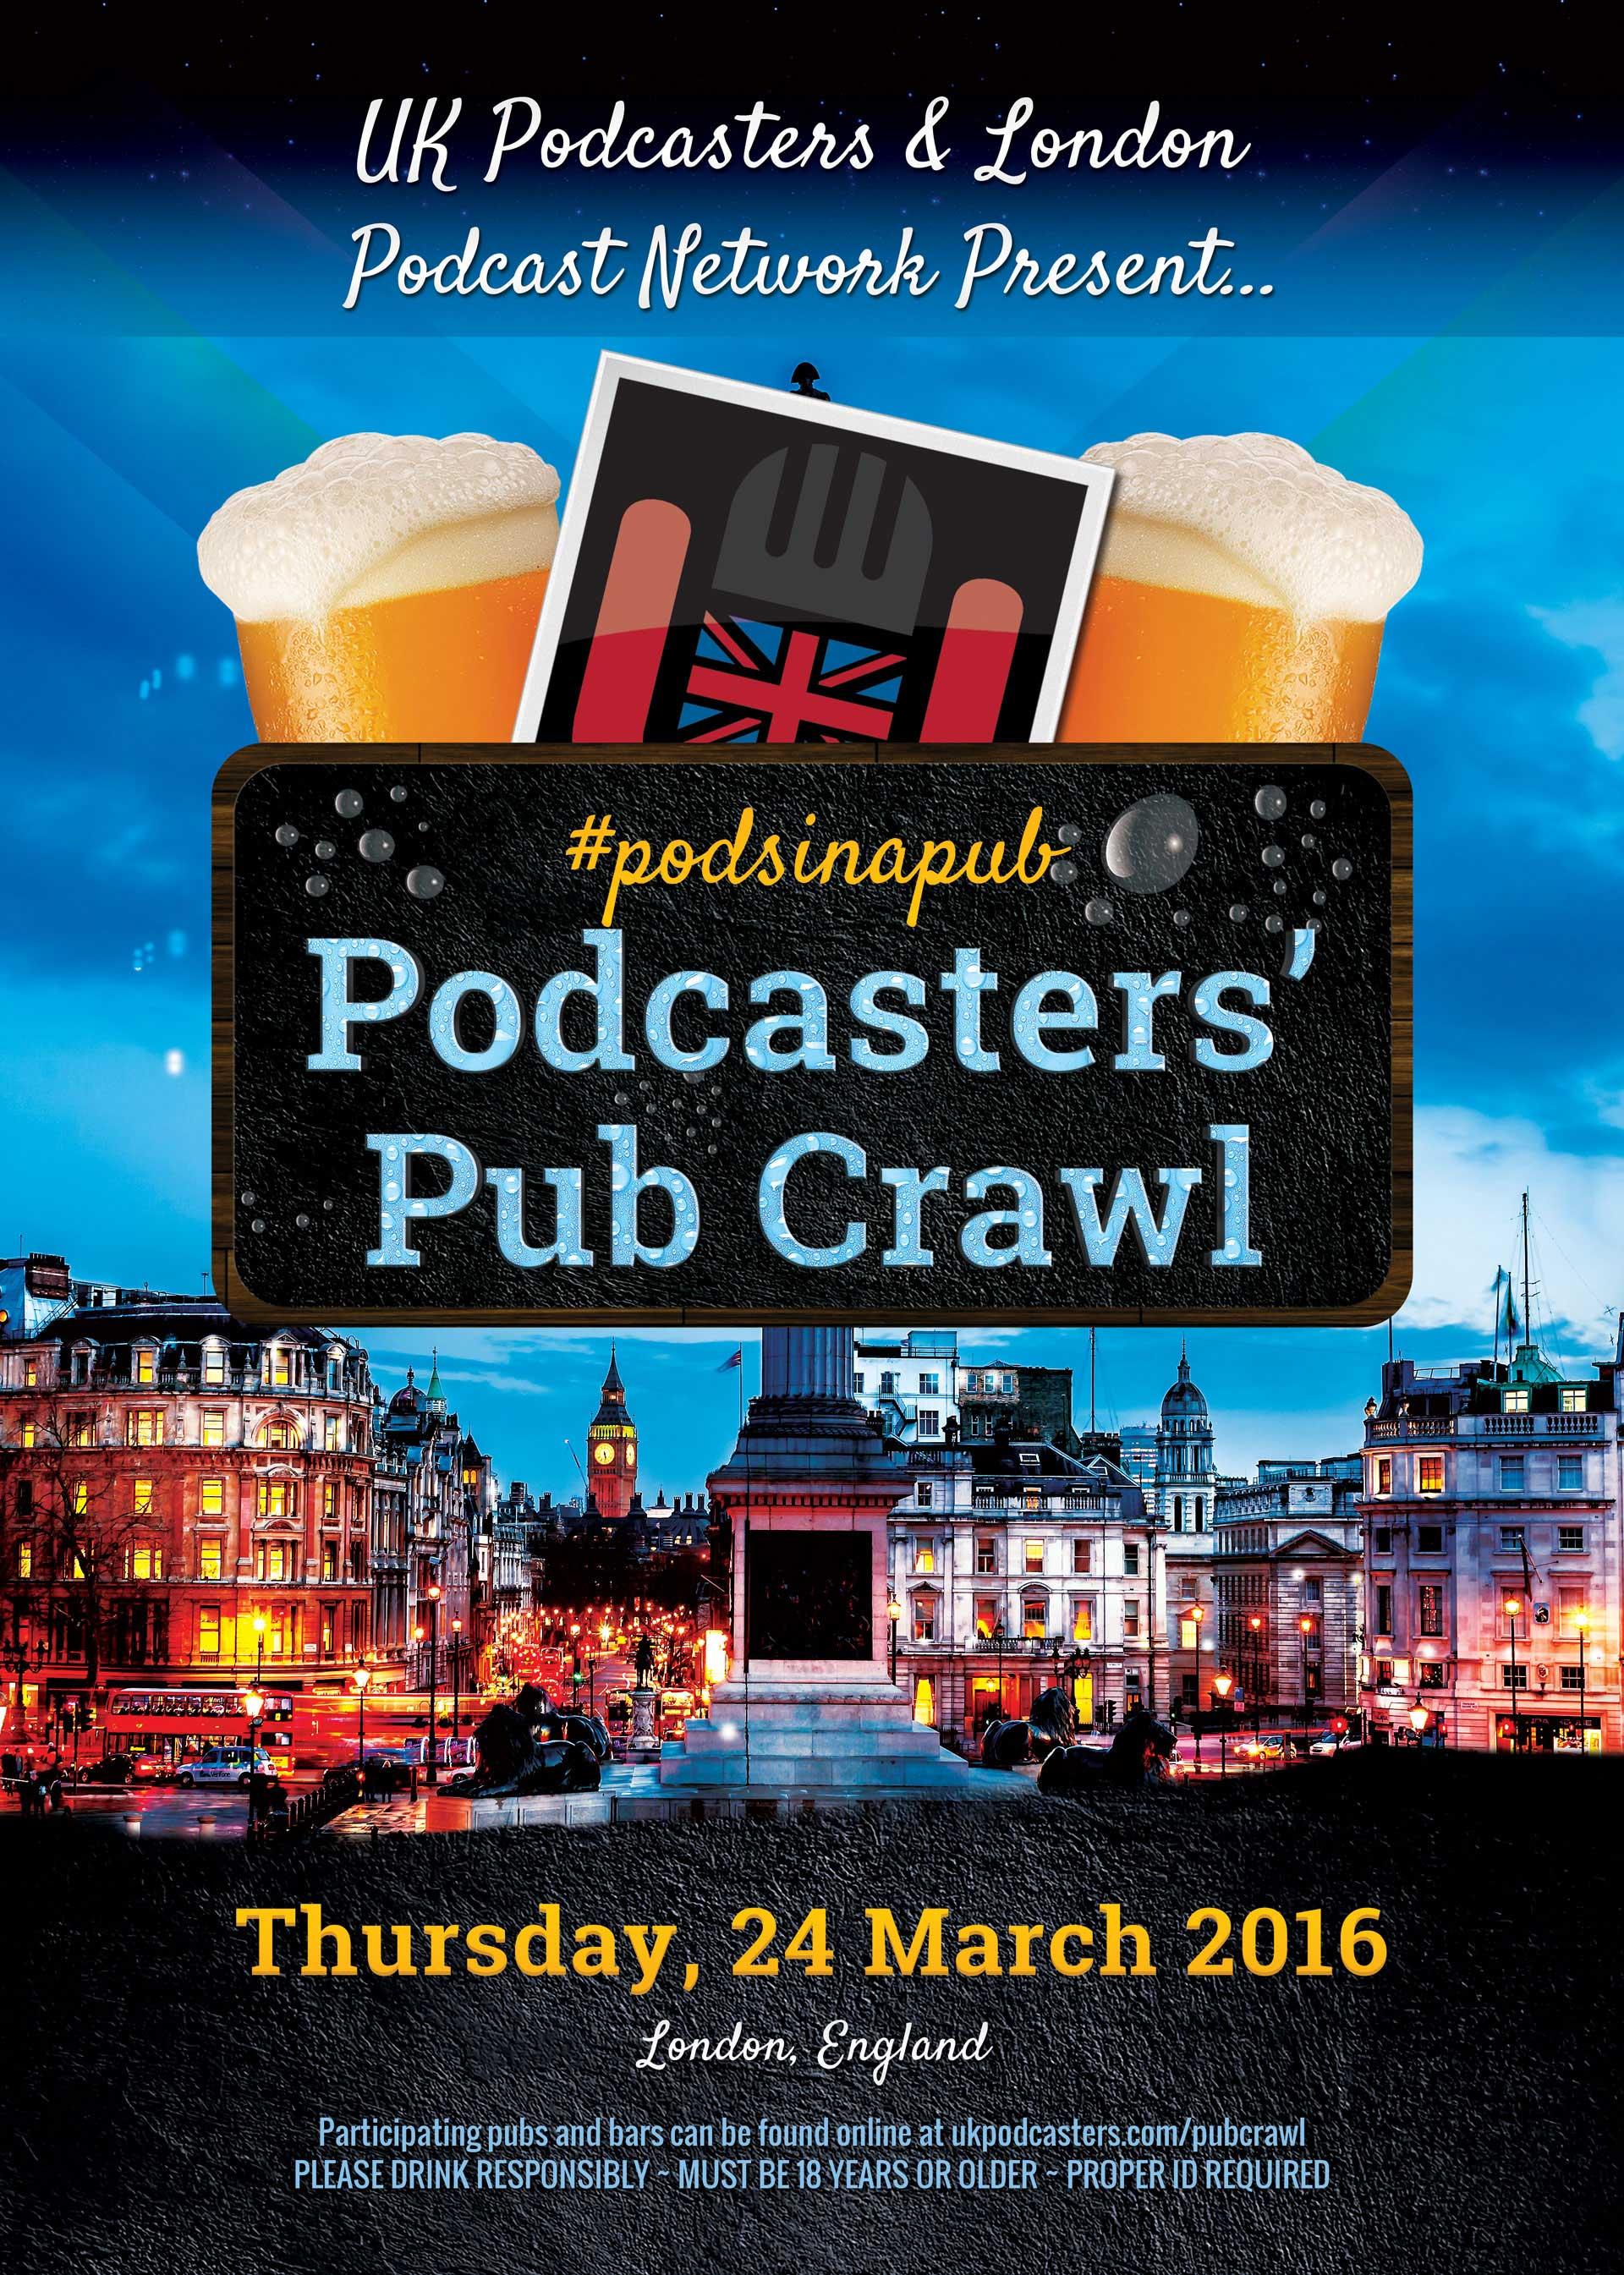 Podcasters' Pub Crawl